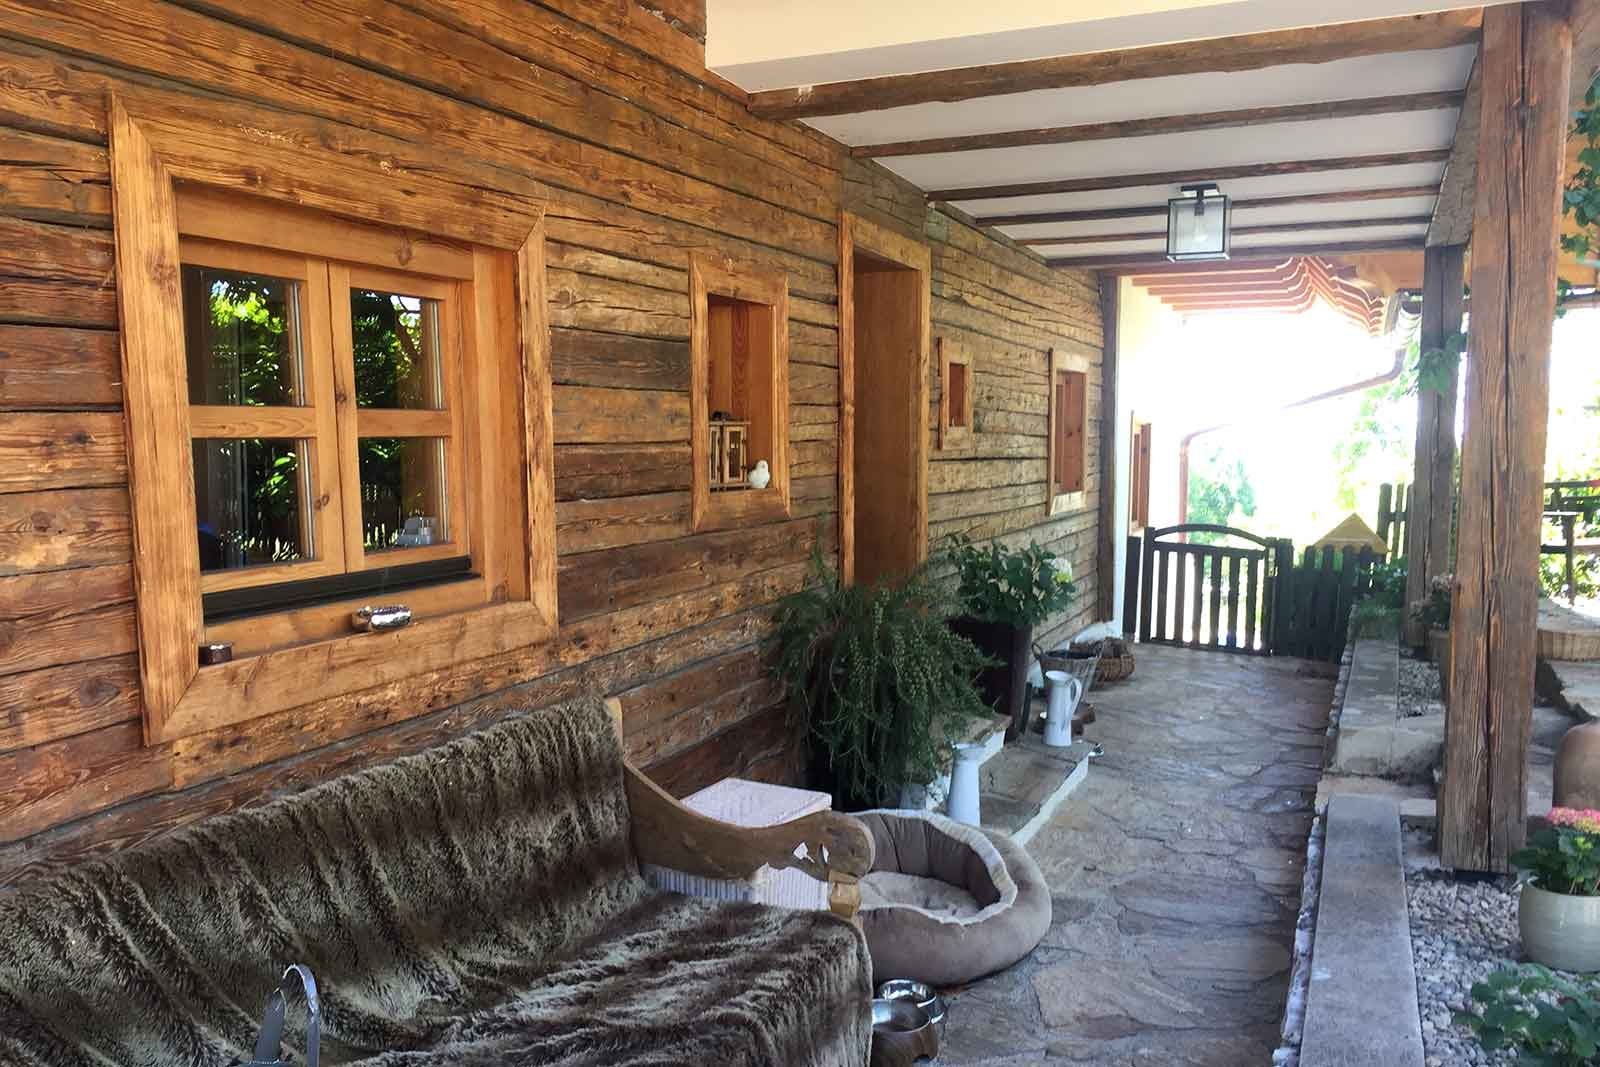 Holzbau-Einfamilienhaus